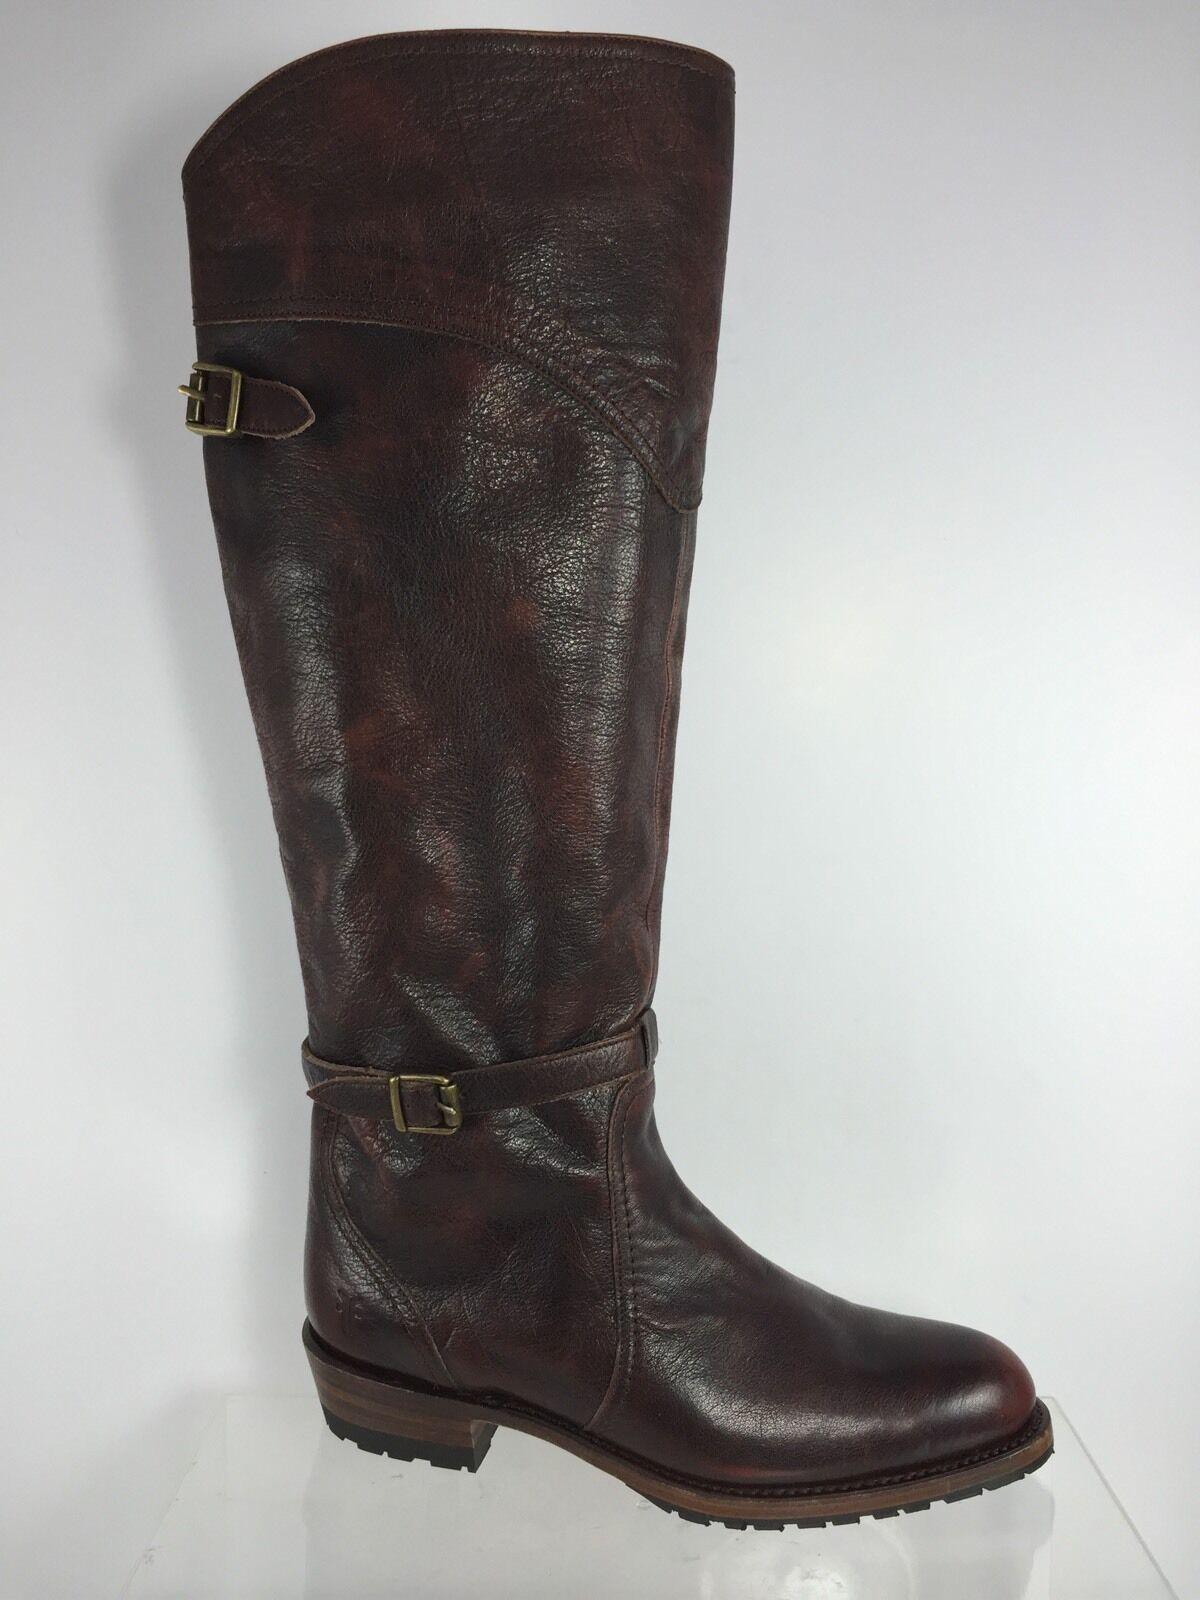 Frye damen Dark Burgundy Leather Knee Stiefel 8